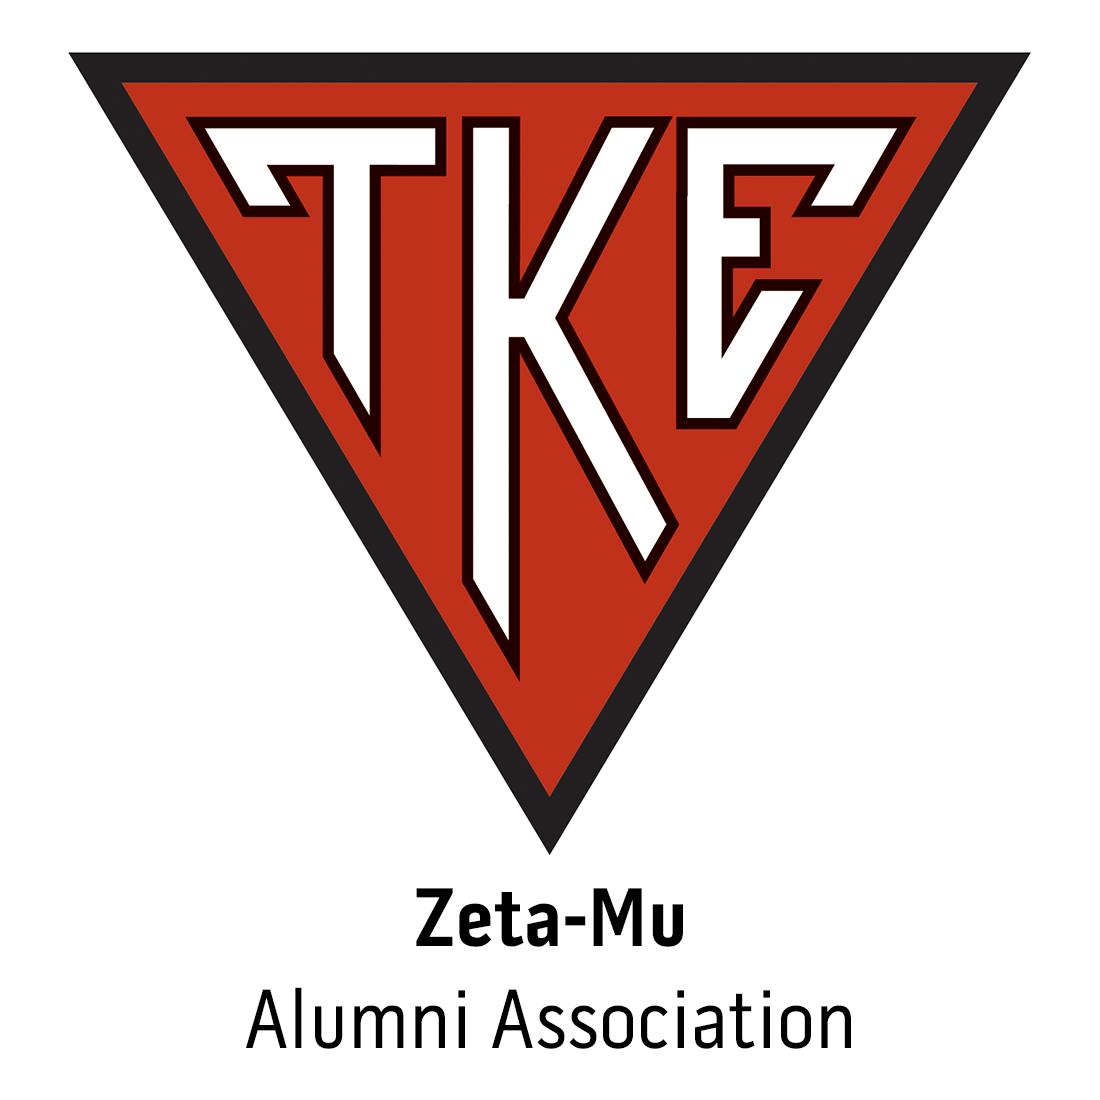 Zeta-Mu Alumni Association for Worcester Polytechnic Institute